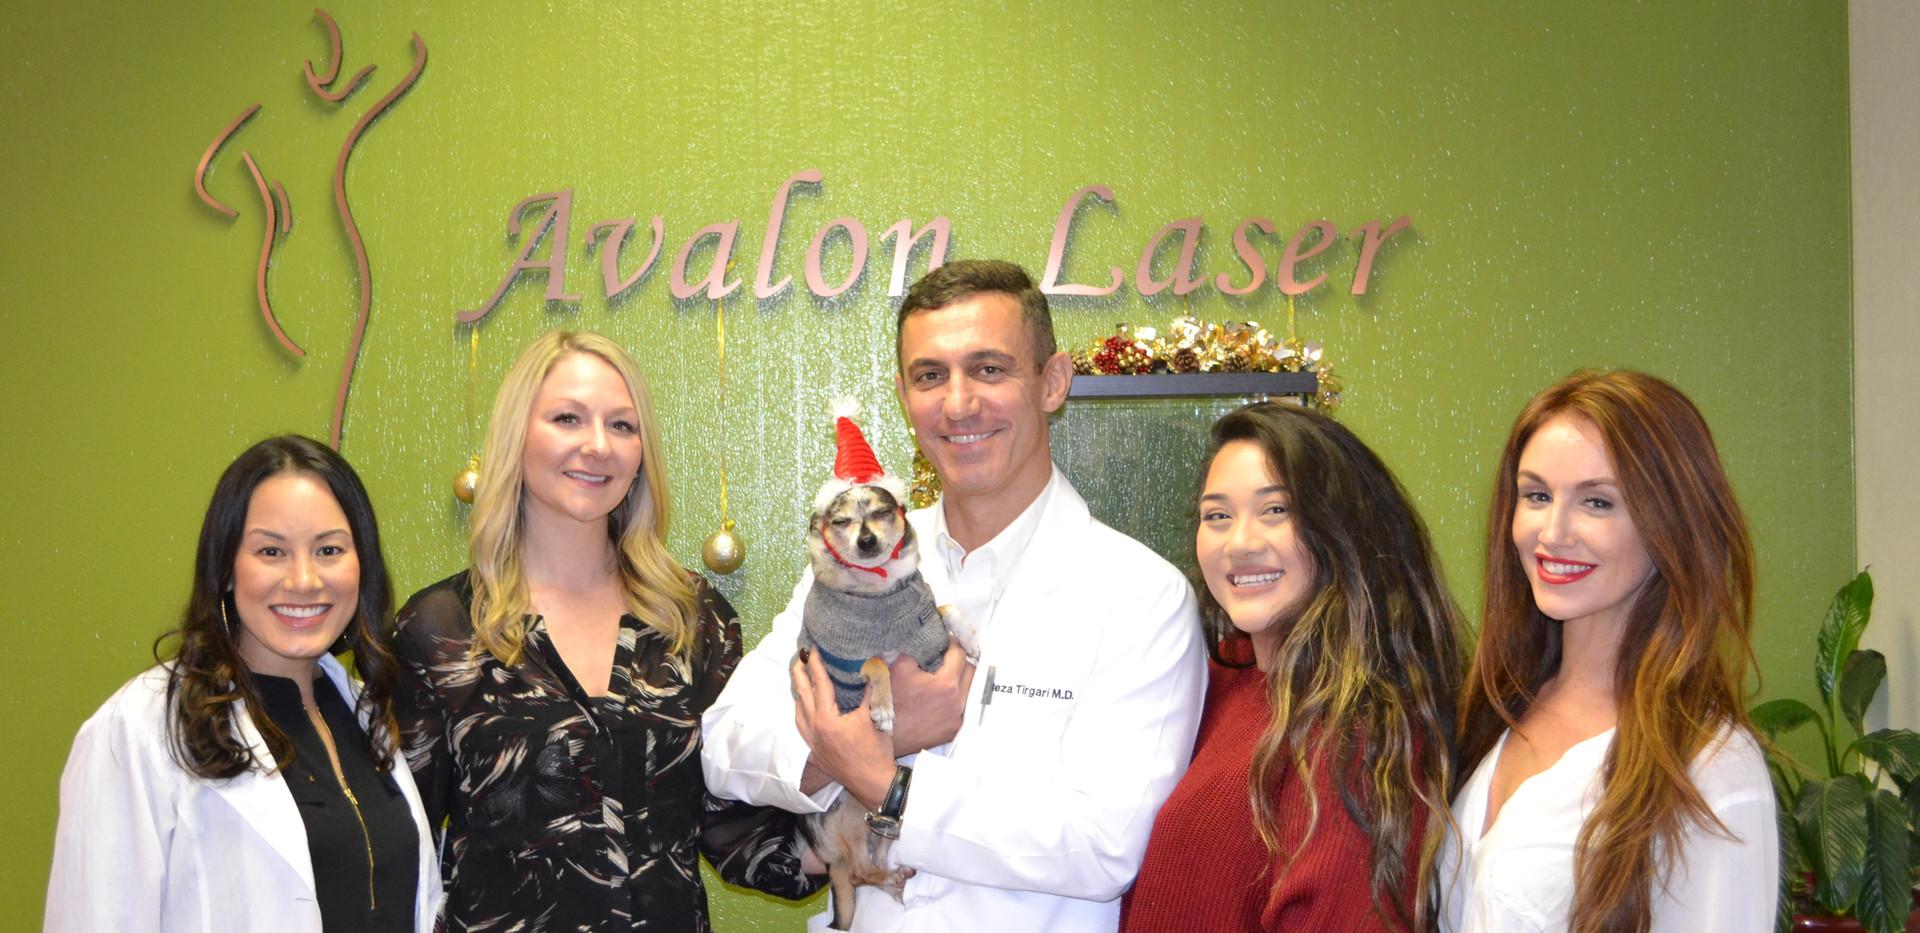 Avalon Laser Fundraiser 2018